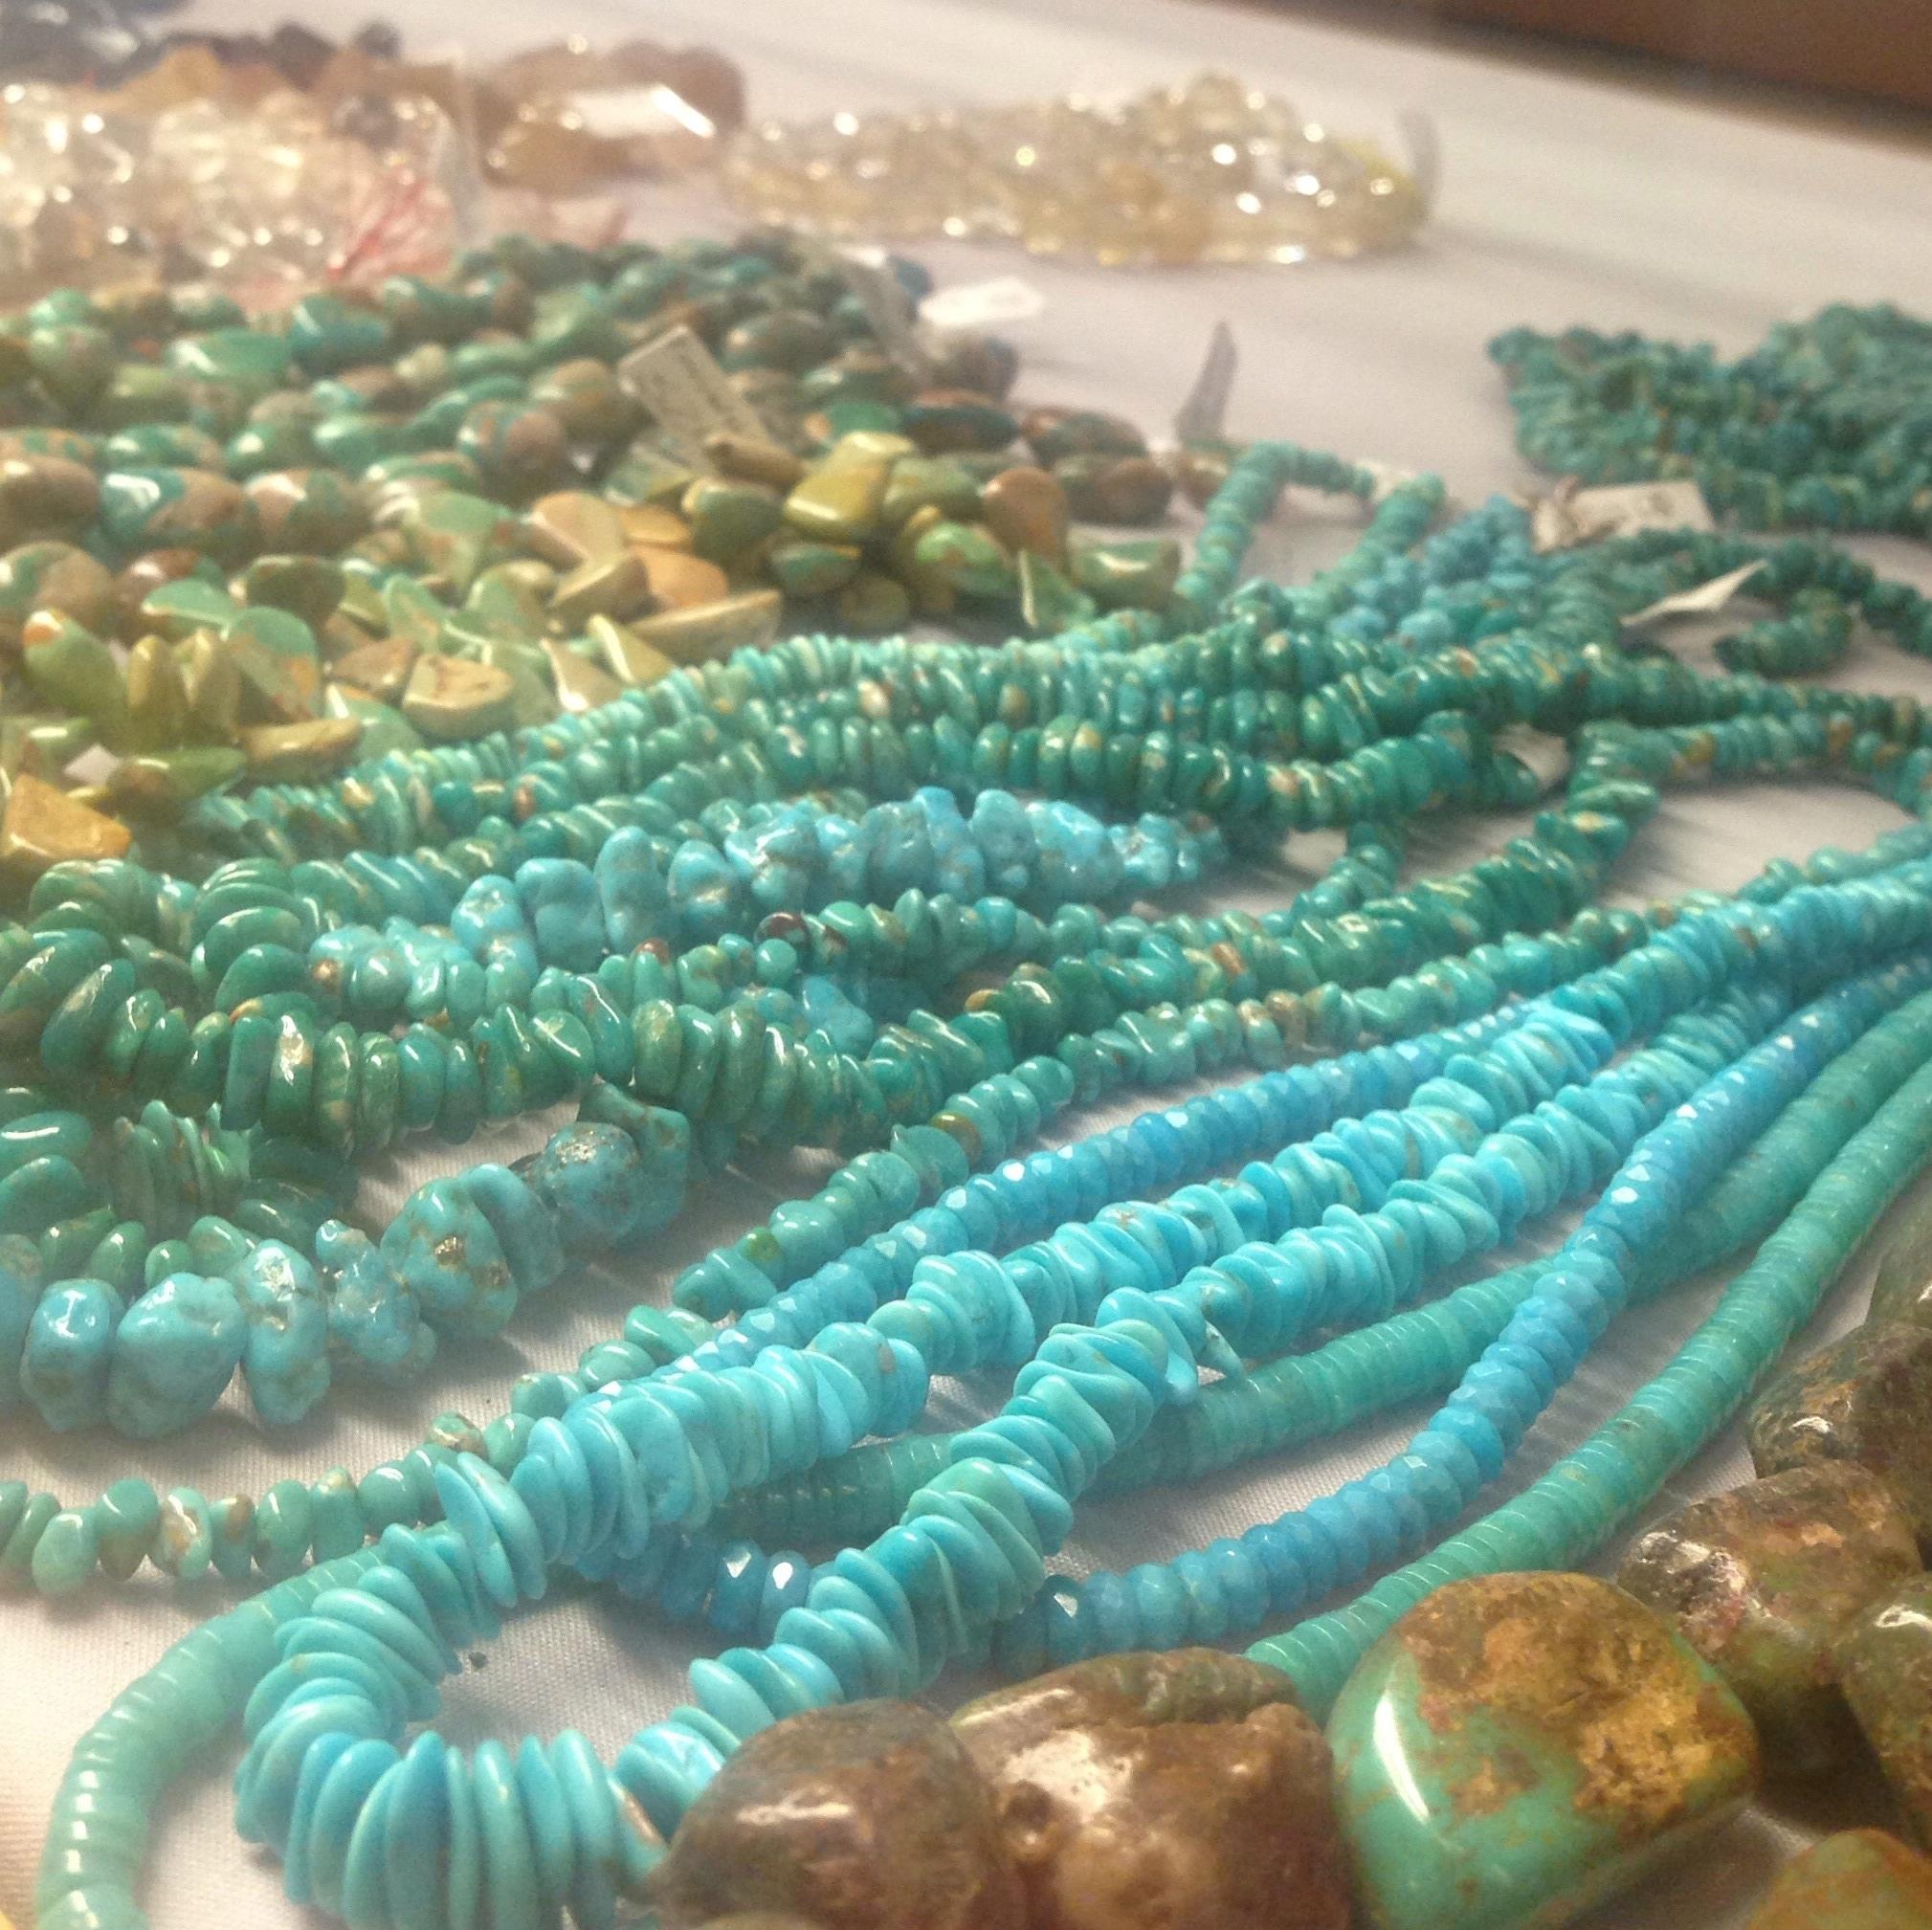 jewelry-shop-wonders-of-the-world-spokane-washington